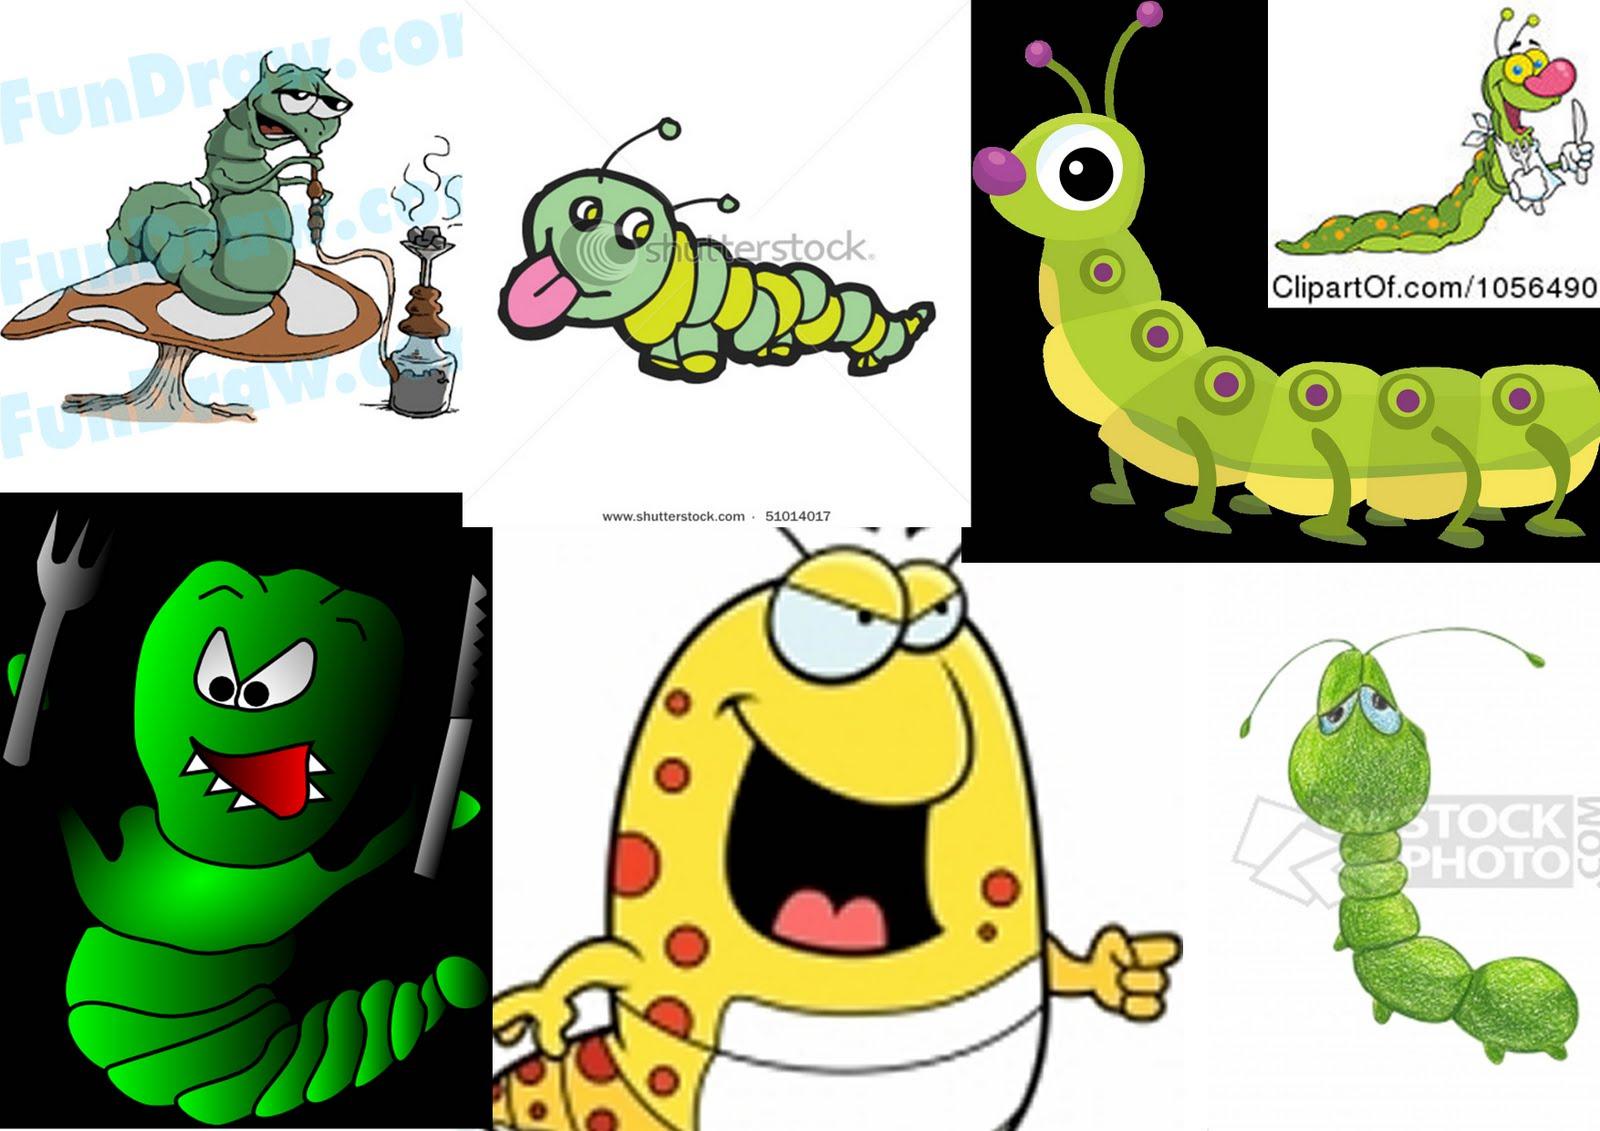 Caterpillar clipart character. Victoria s interactive media